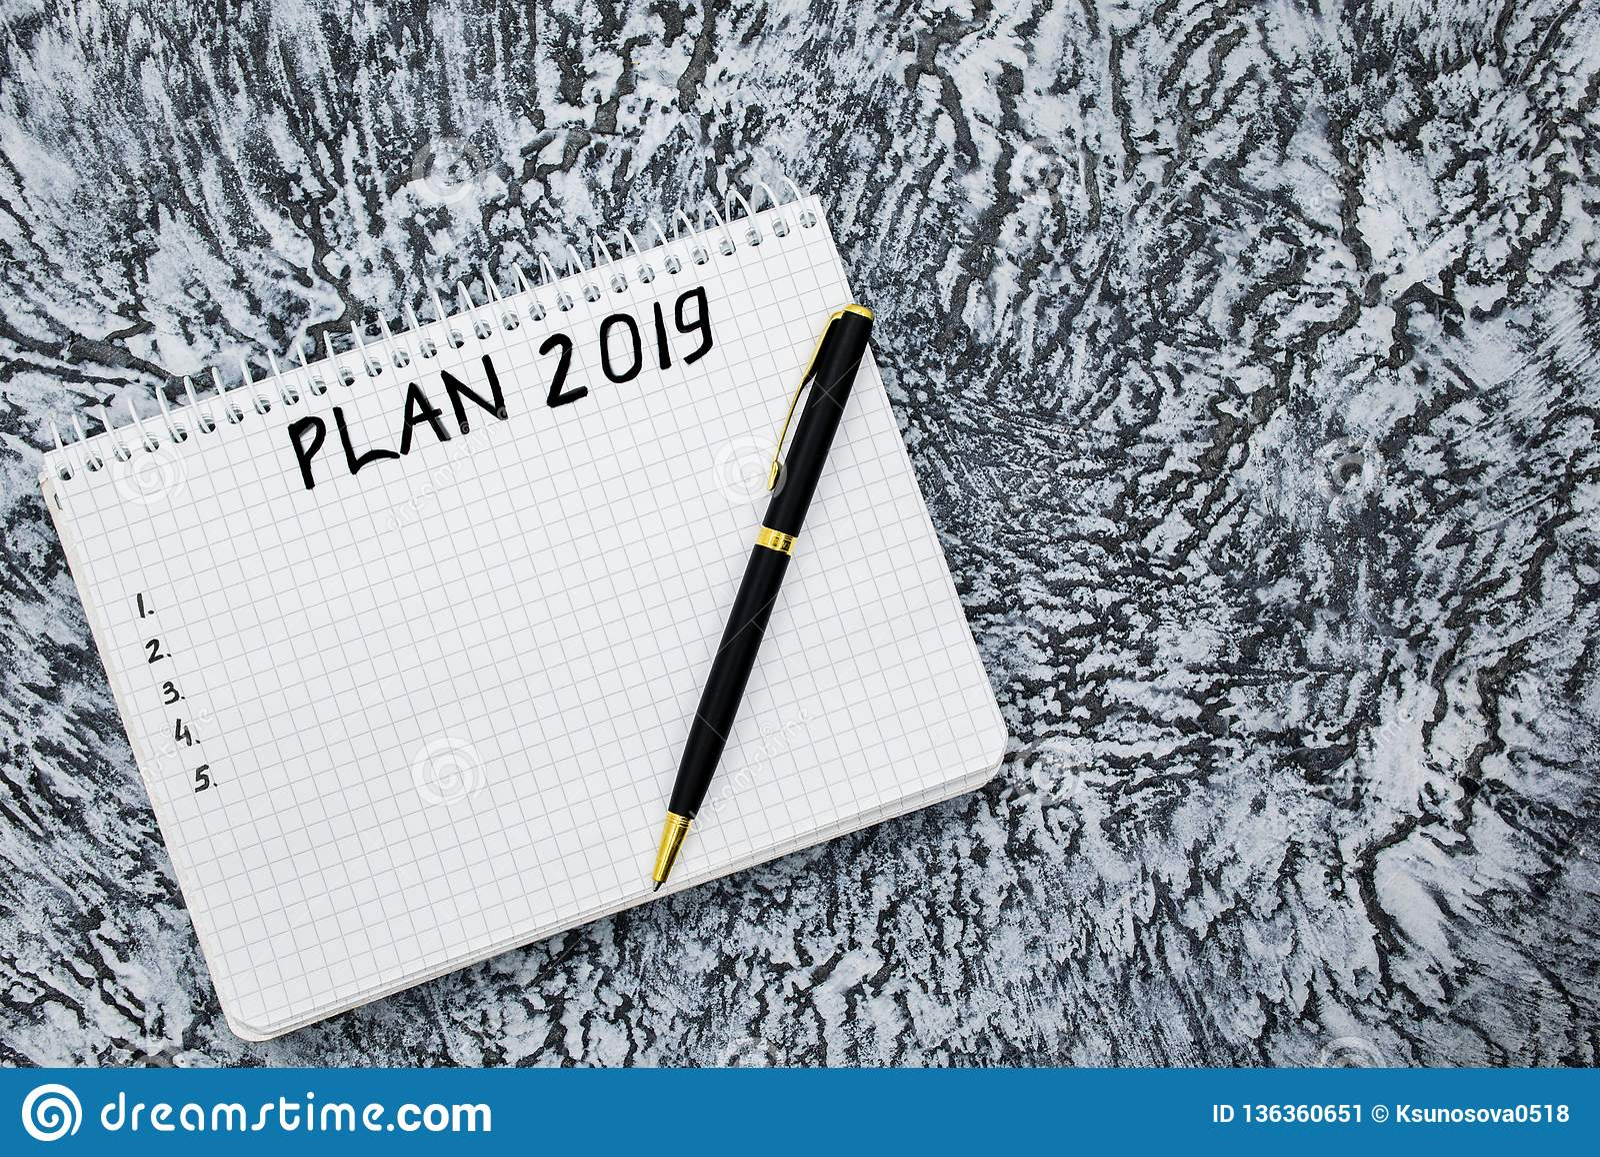 Plan dla 2019, notepad i pióro na textured szarym tle,